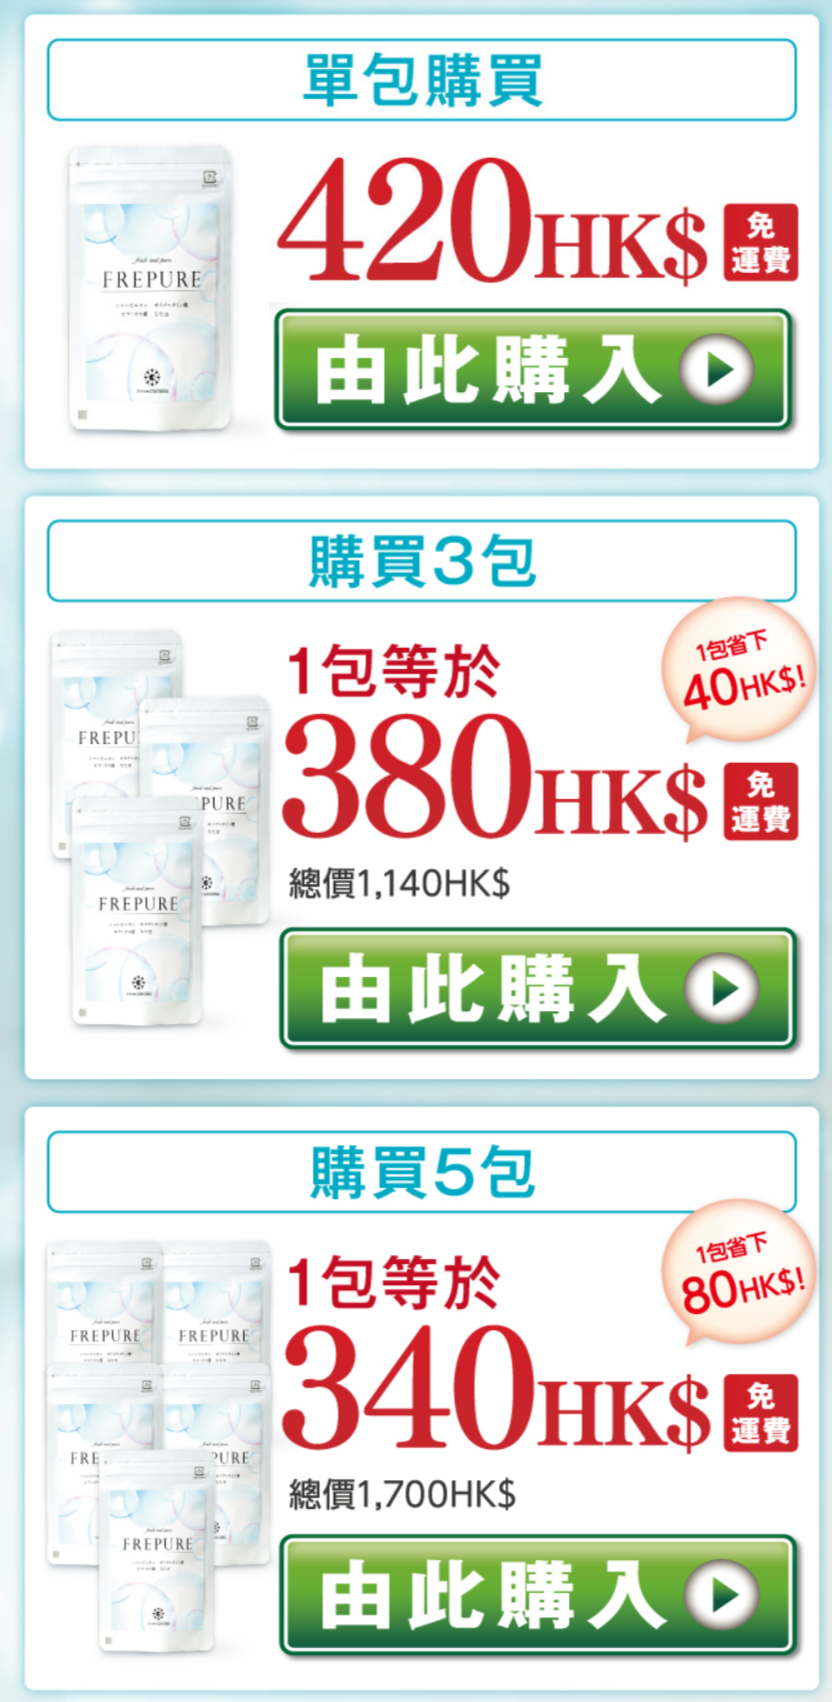 FREPURE的香港價格